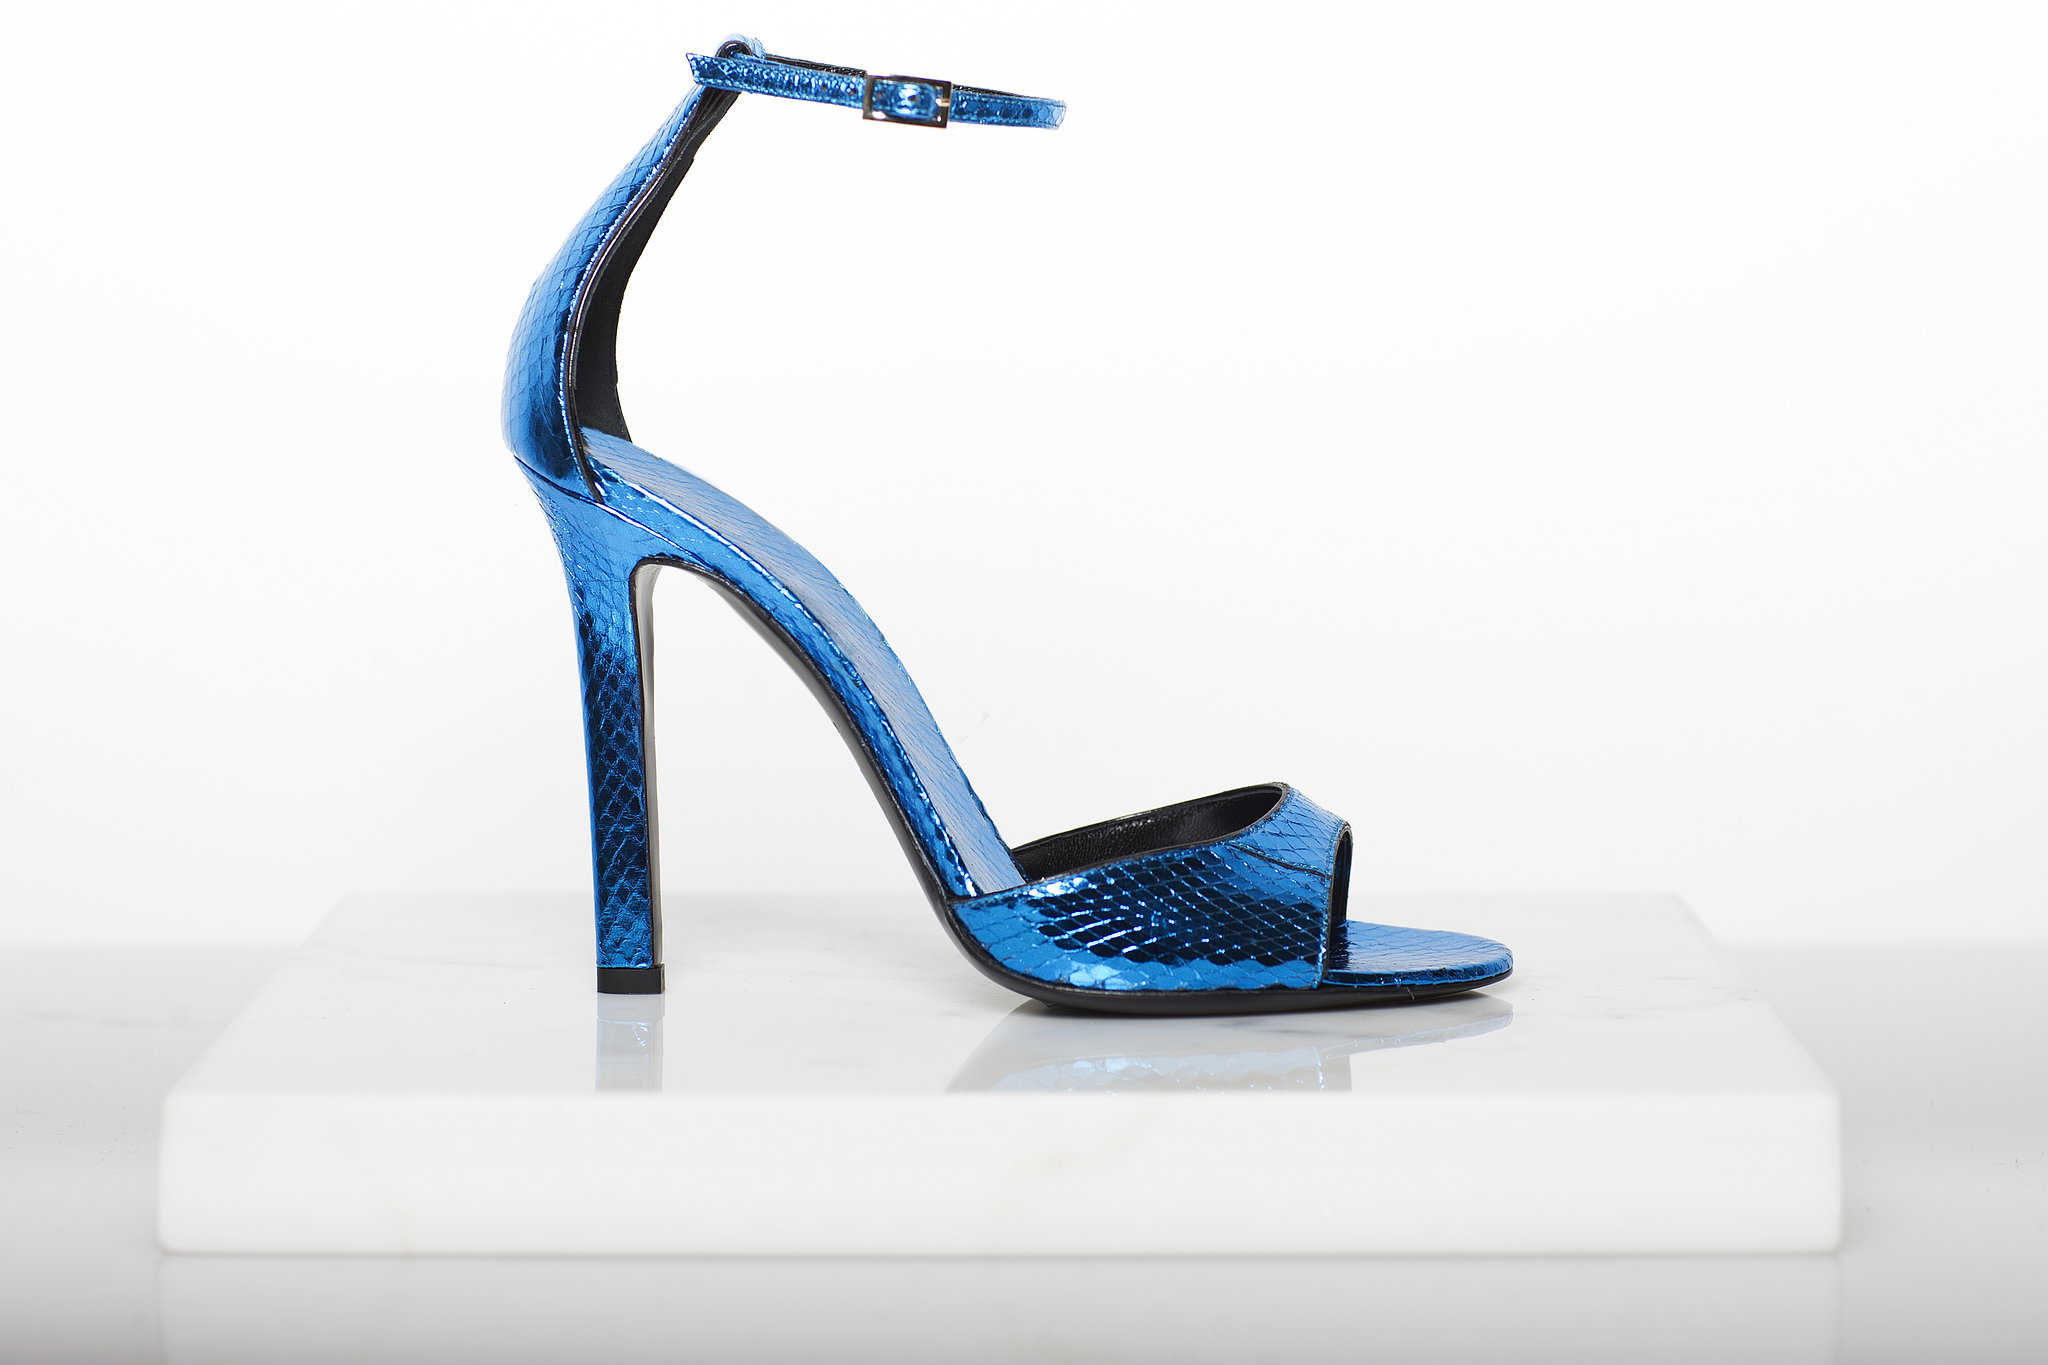 Whisper Watersnake Sandal in Turquoise ($750) Photo courtesy of Tamara Mellon